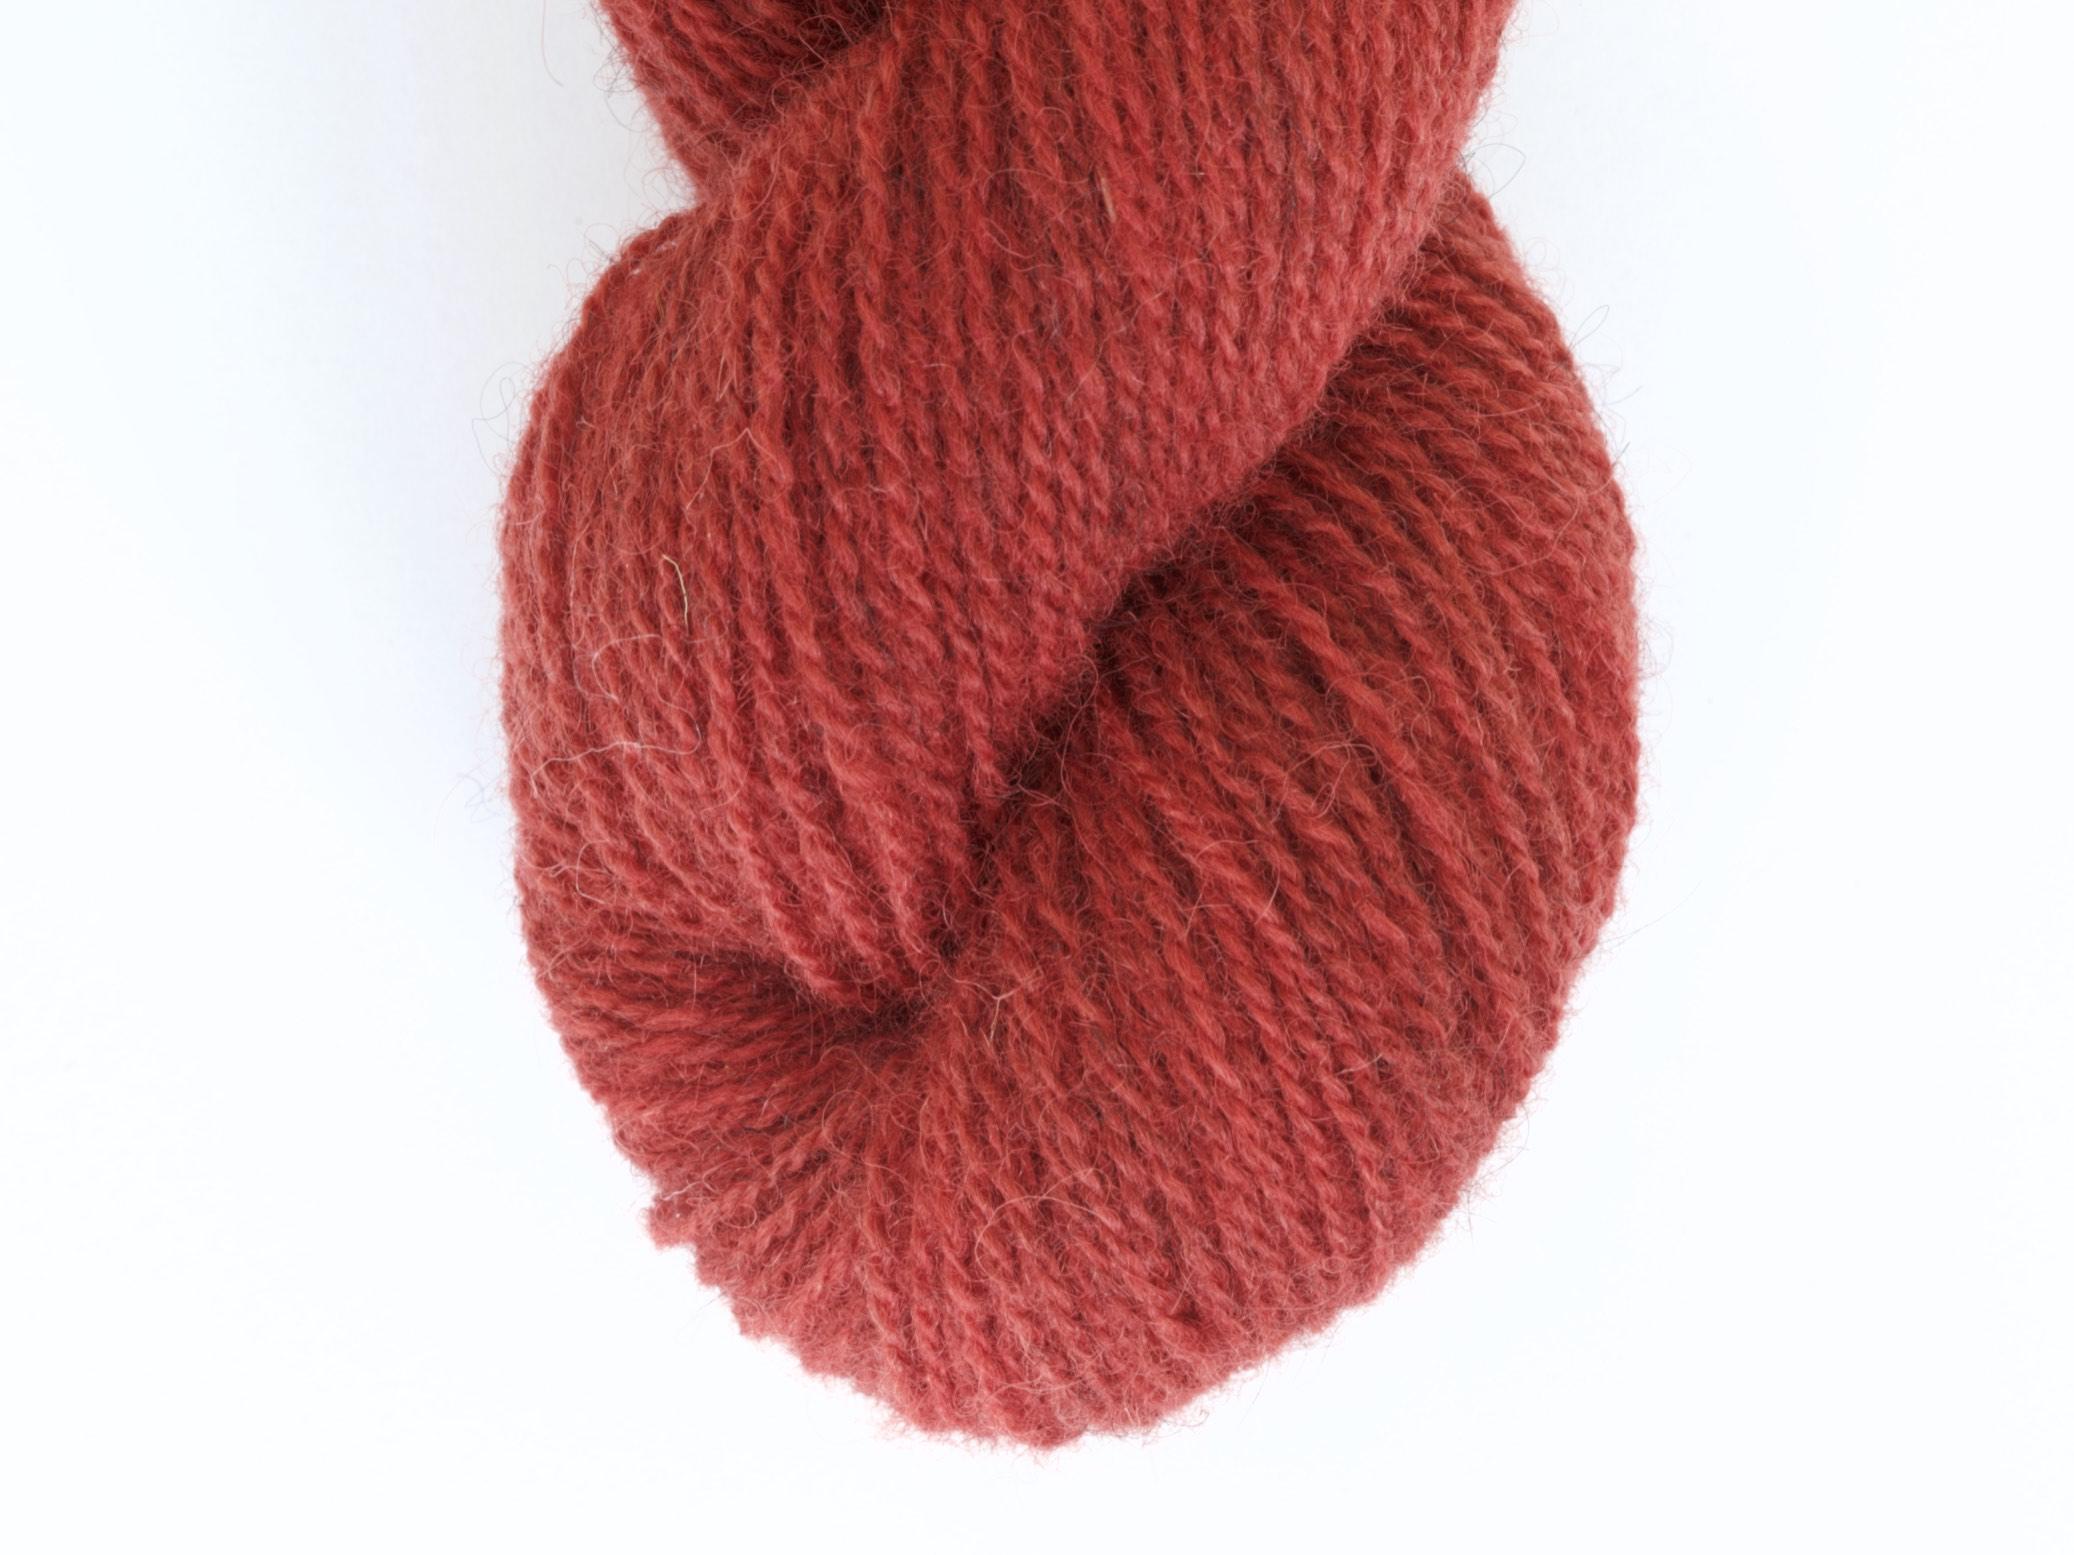 Bohus Stickning garn yarn BS 57 red wool